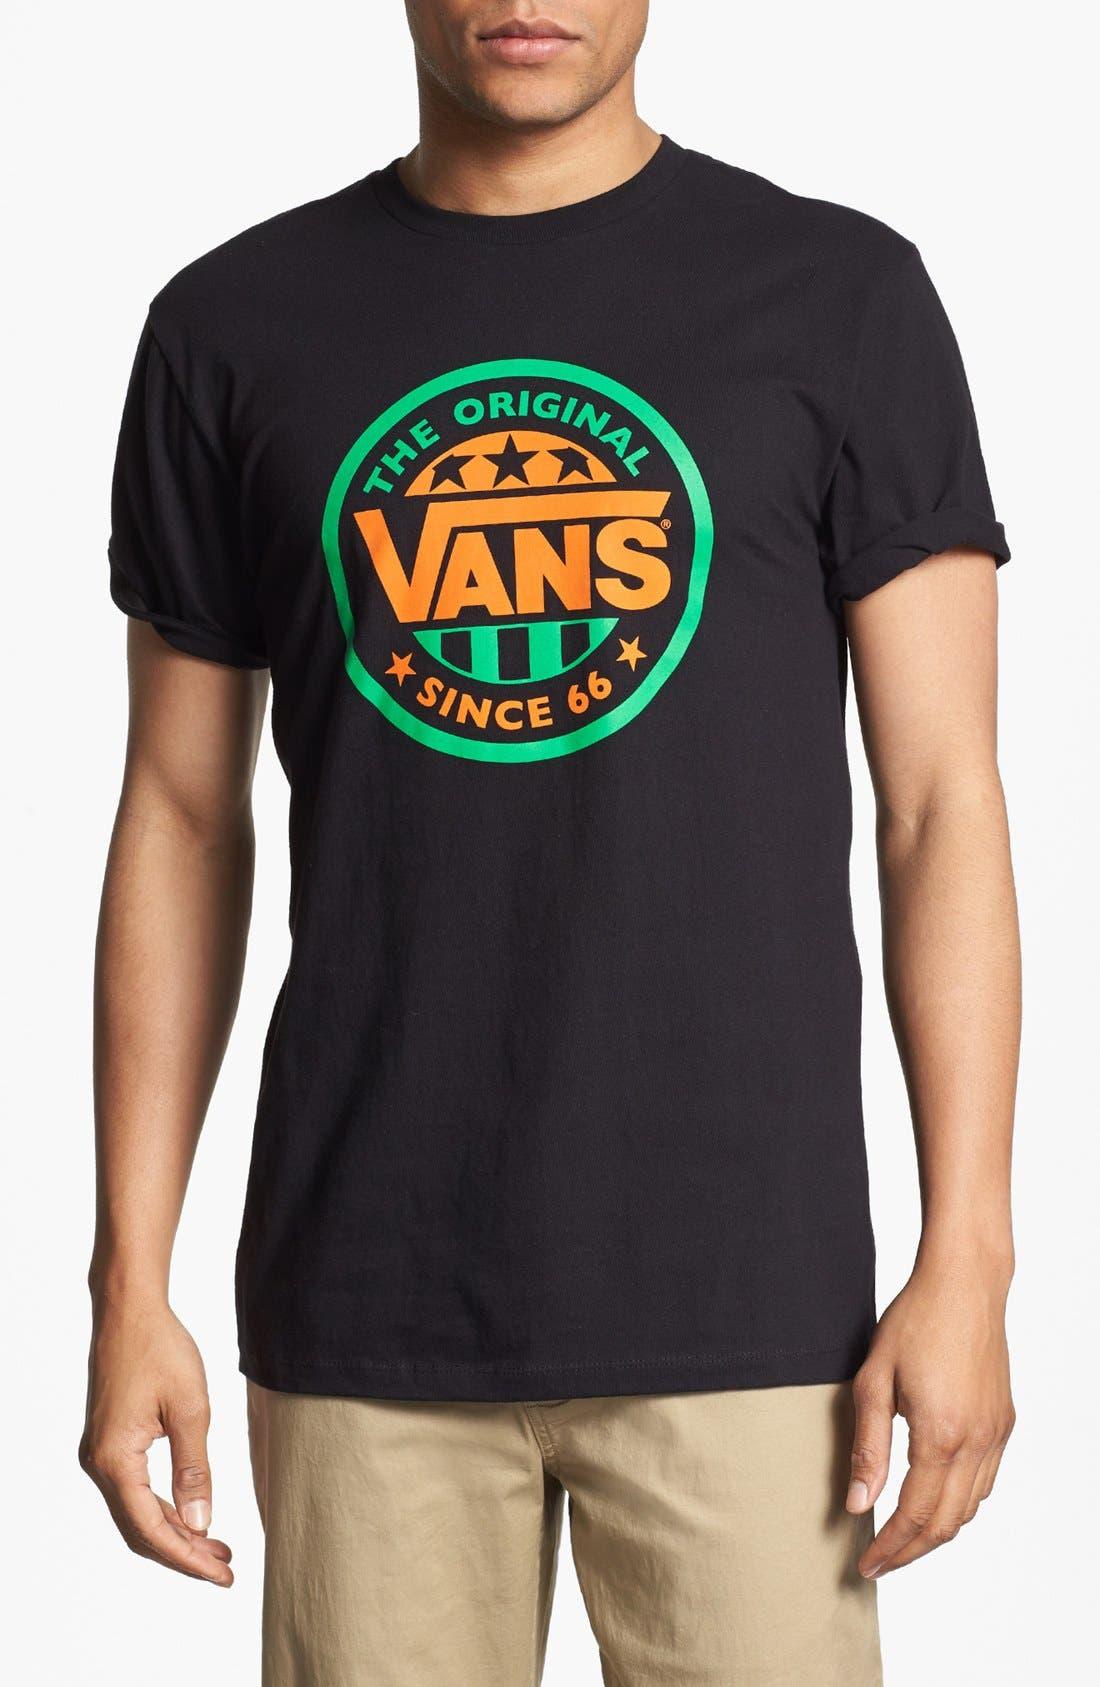 Main Image - Vans 'Original' Graphic T-Shirt